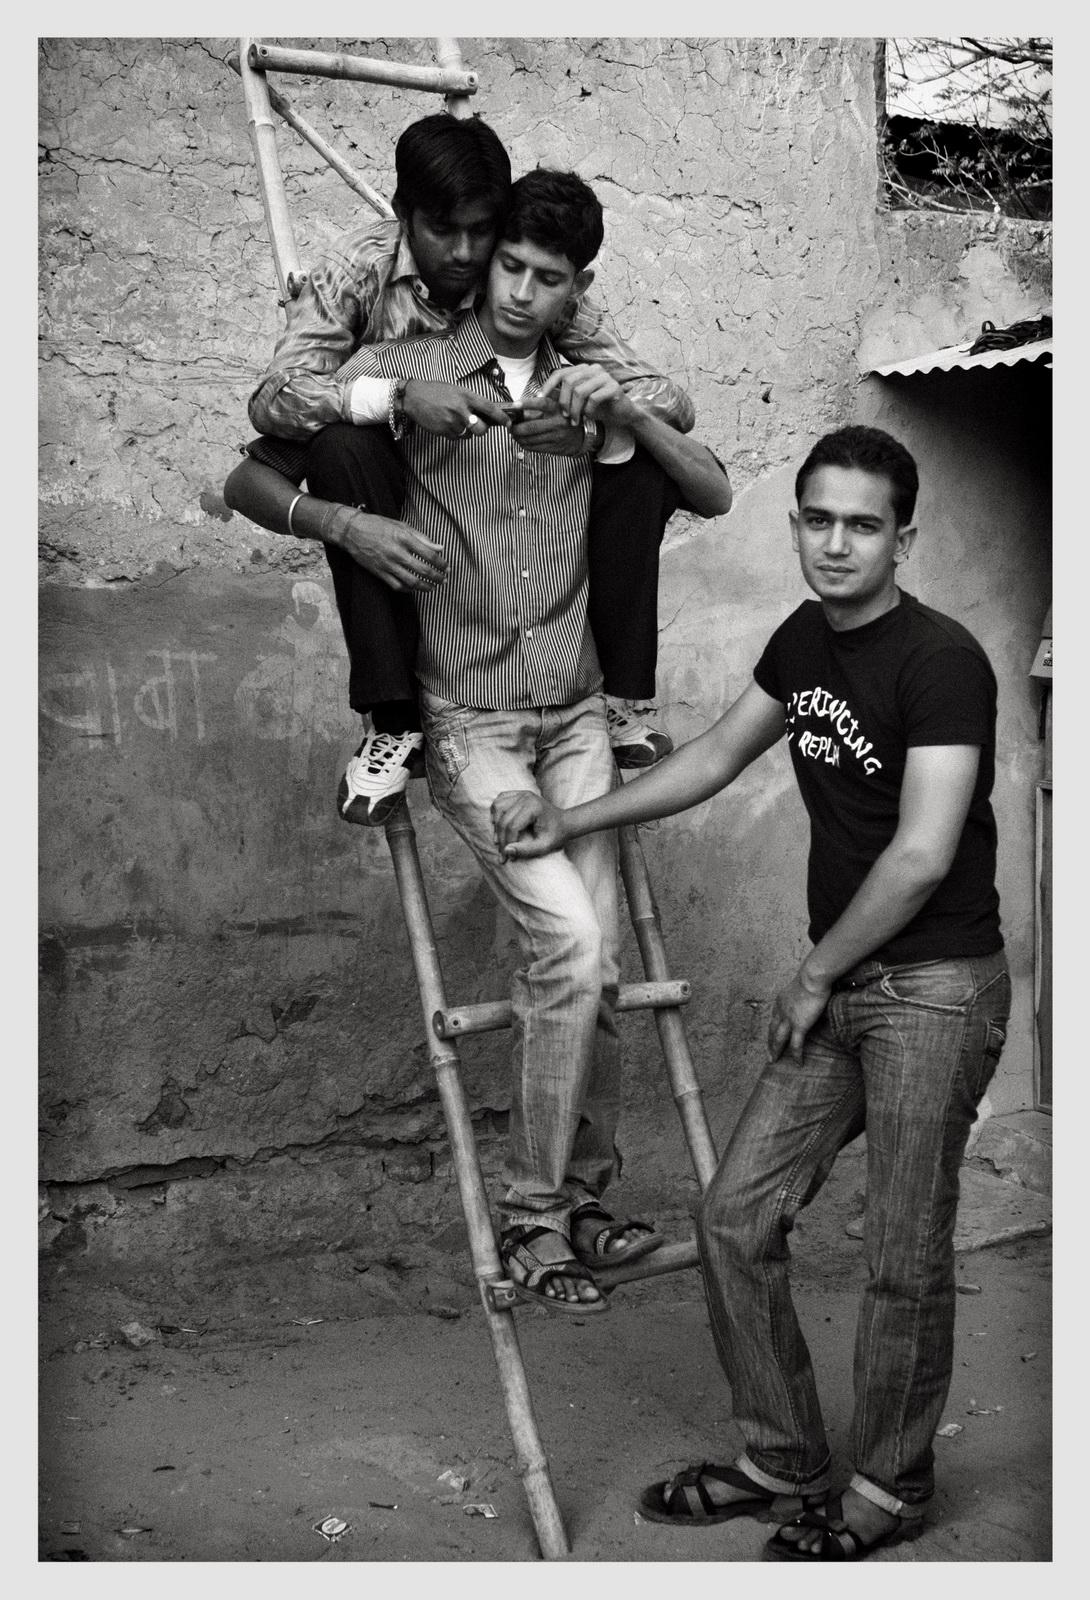 Rajasthan, India 2012